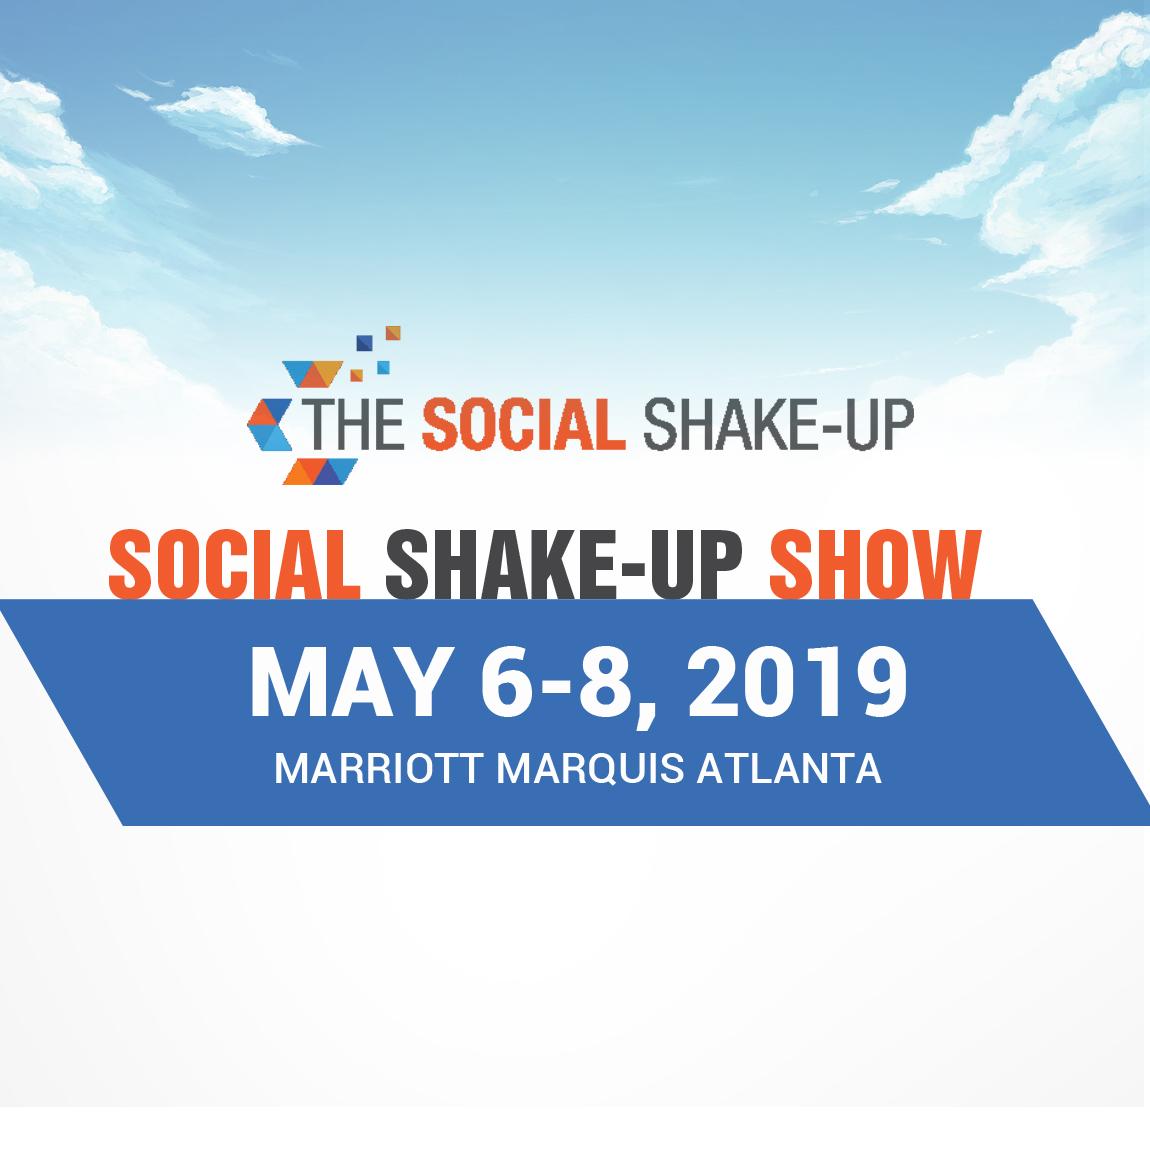 The Social Shake-Up